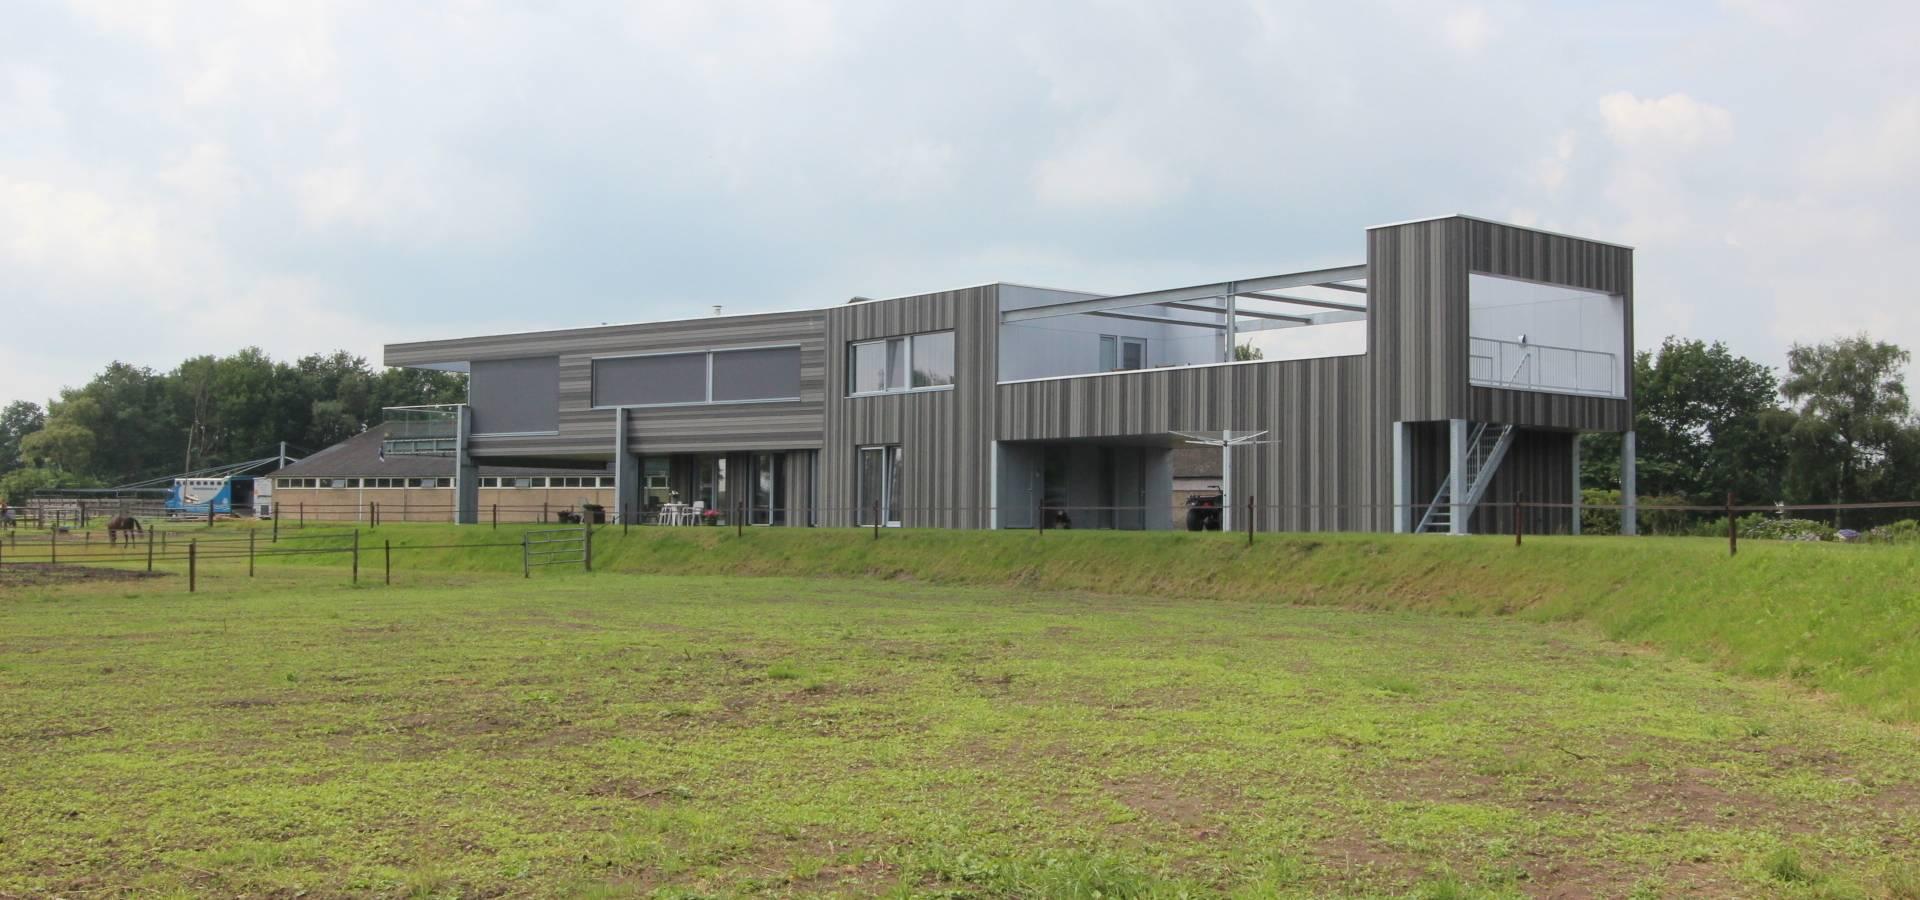 Architectenburo MA2